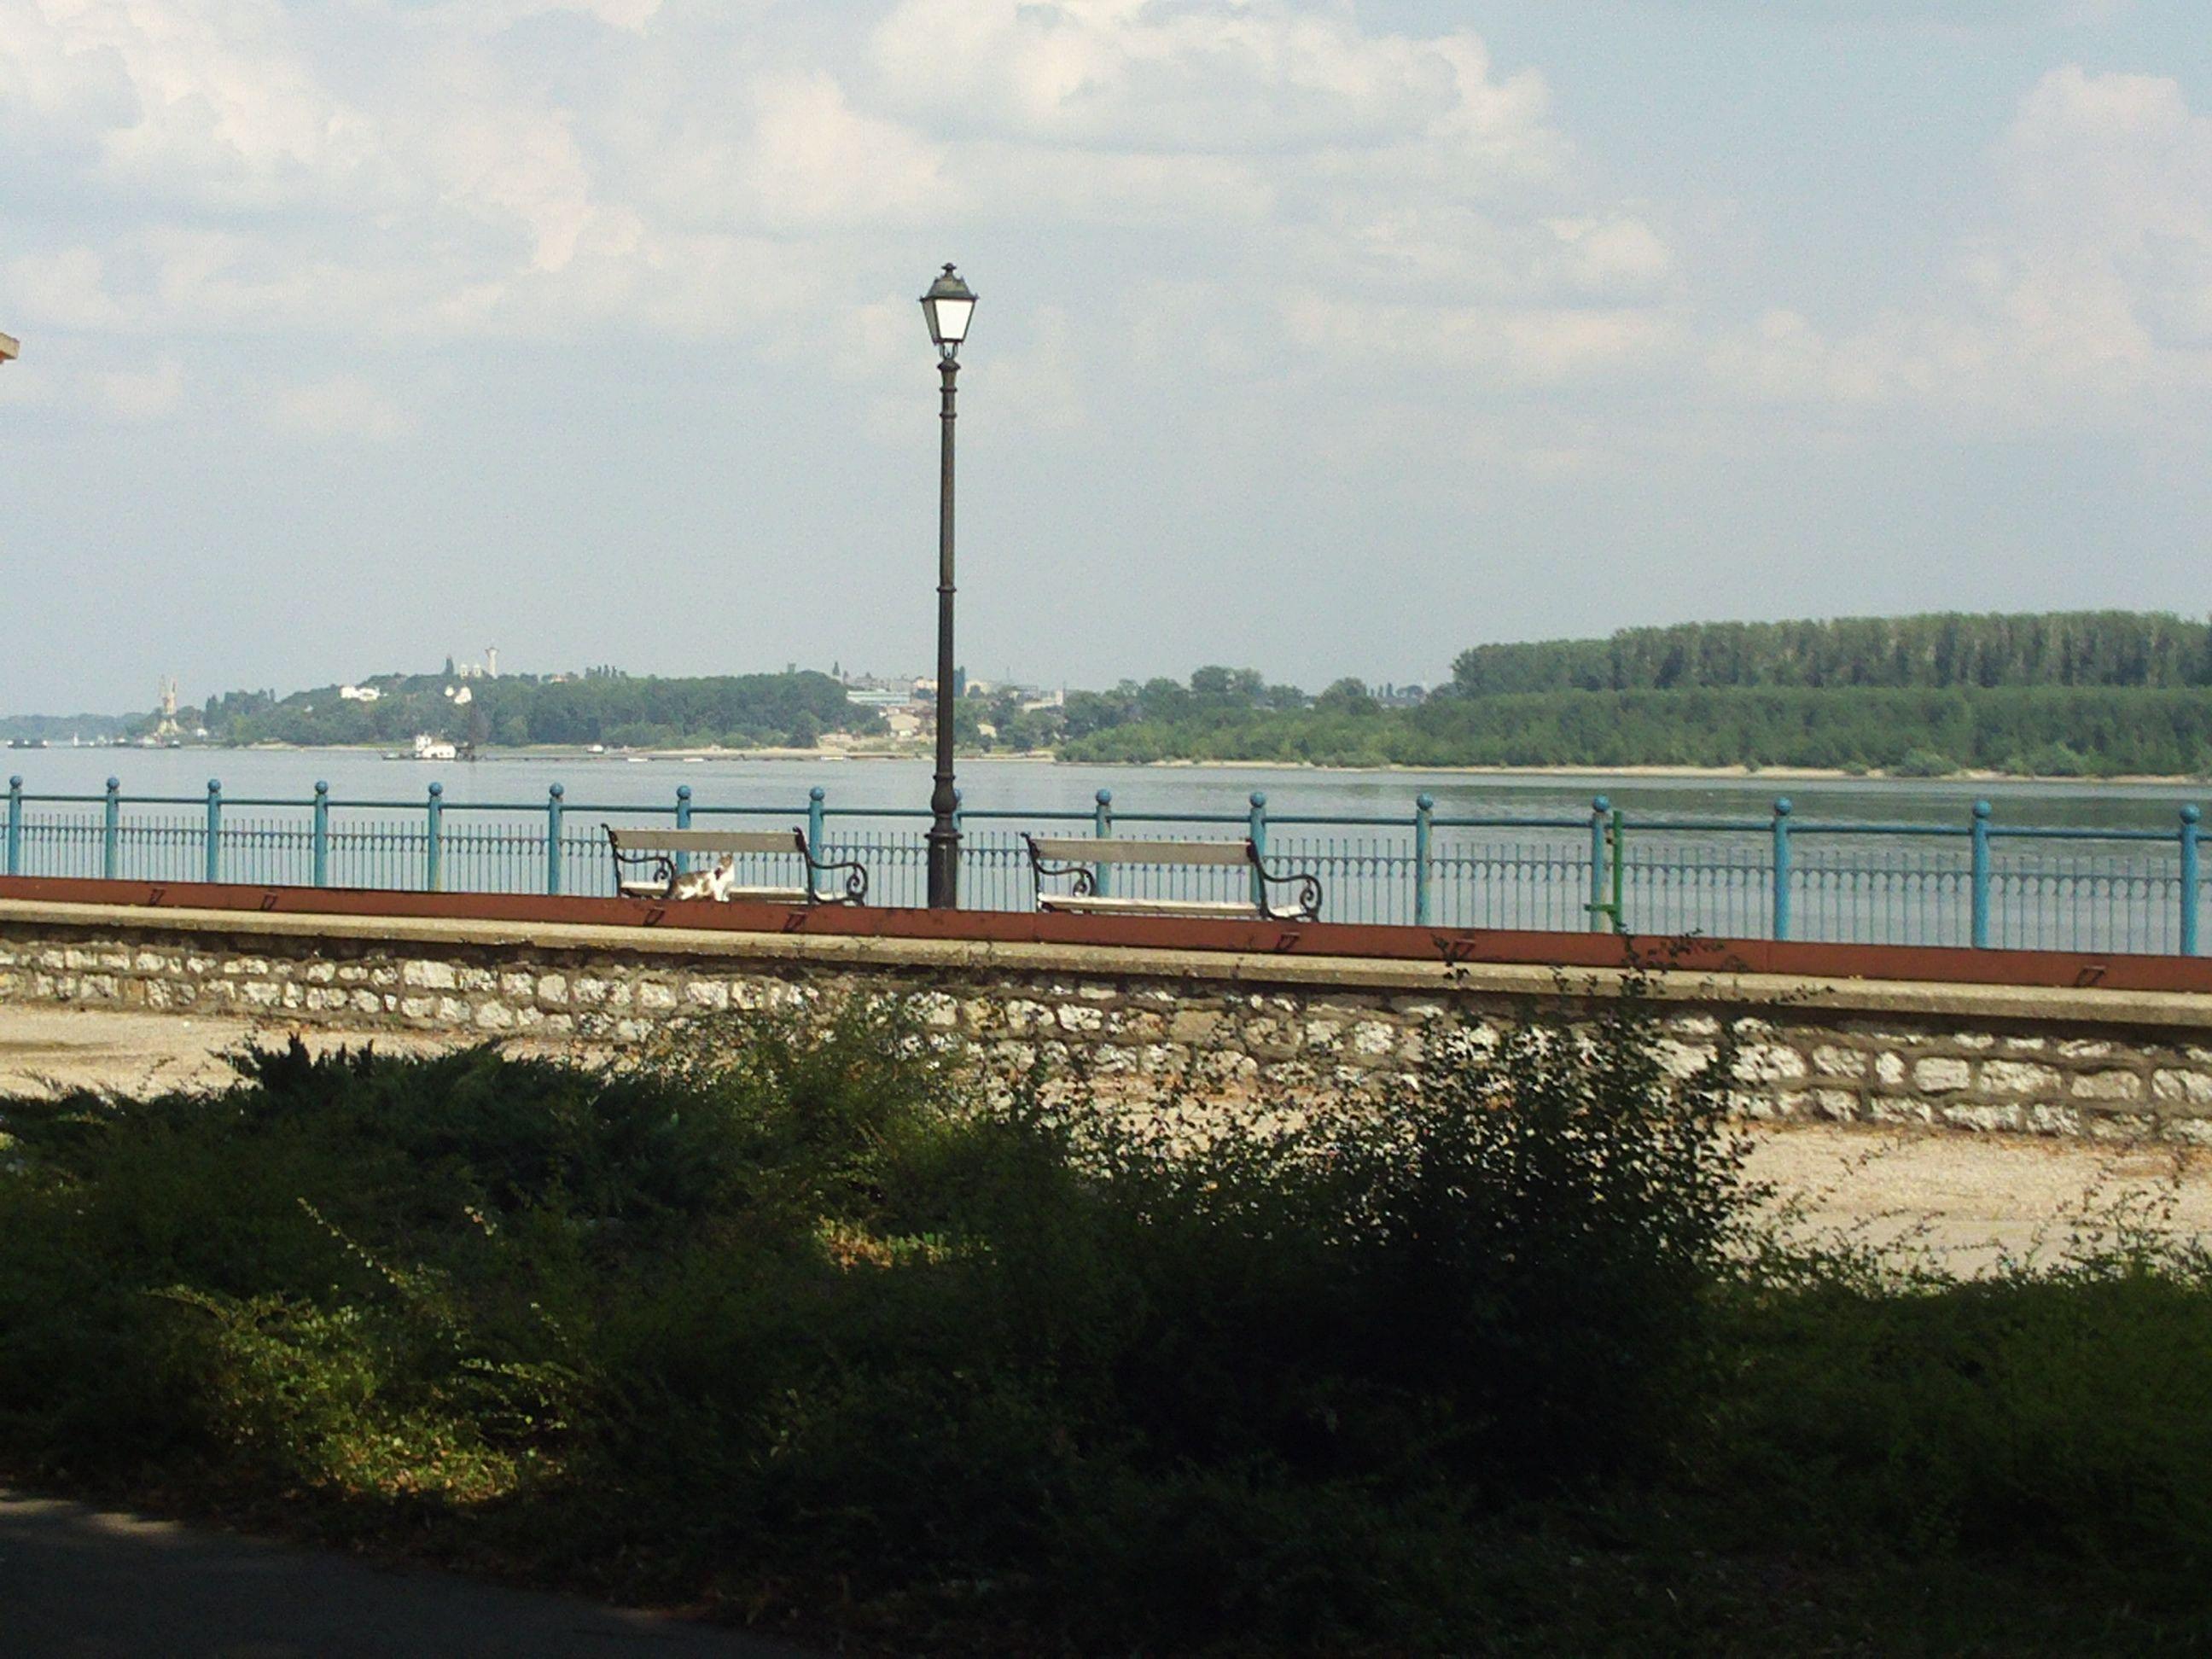 Danube seen from Vidin (Bulgaria) - across the river is Calafat (Romania)